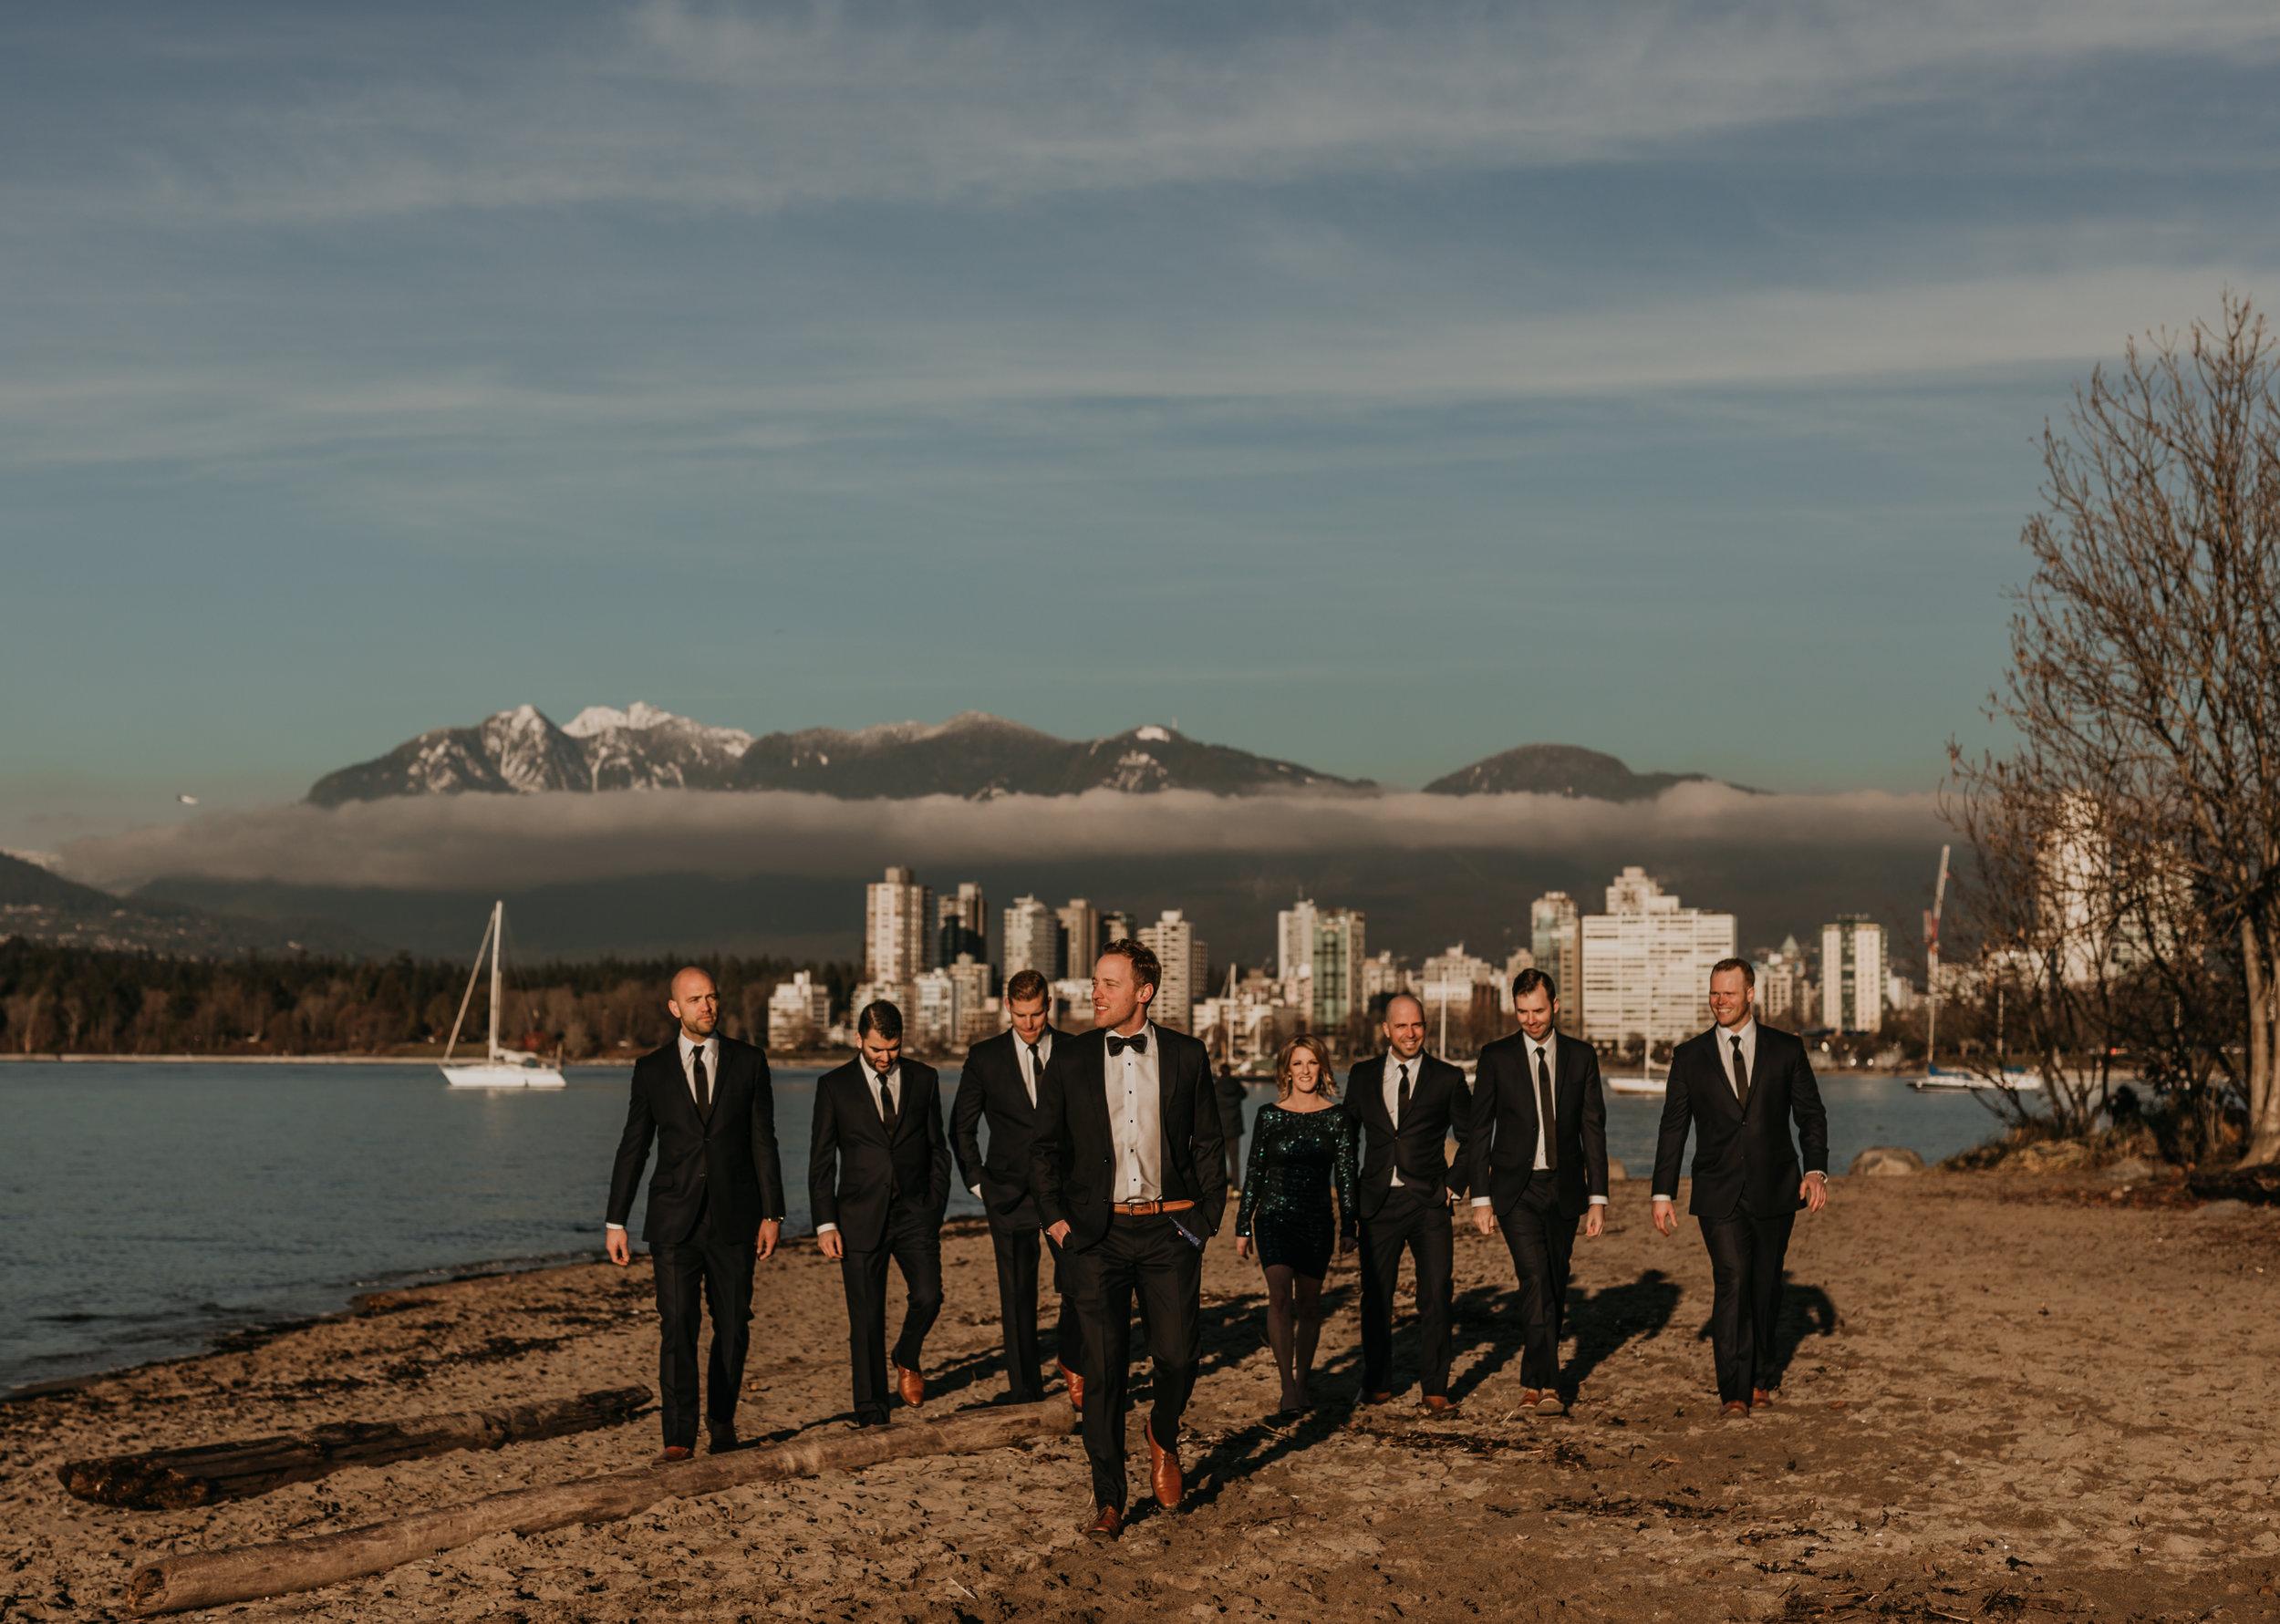 Vancouver Wedding Photos - Vegan Wedding Photographer - New Years Eve Wedding Photos - Vancouver Wedding Photographer - Vancouver Wedding Videographer - 497.JPG